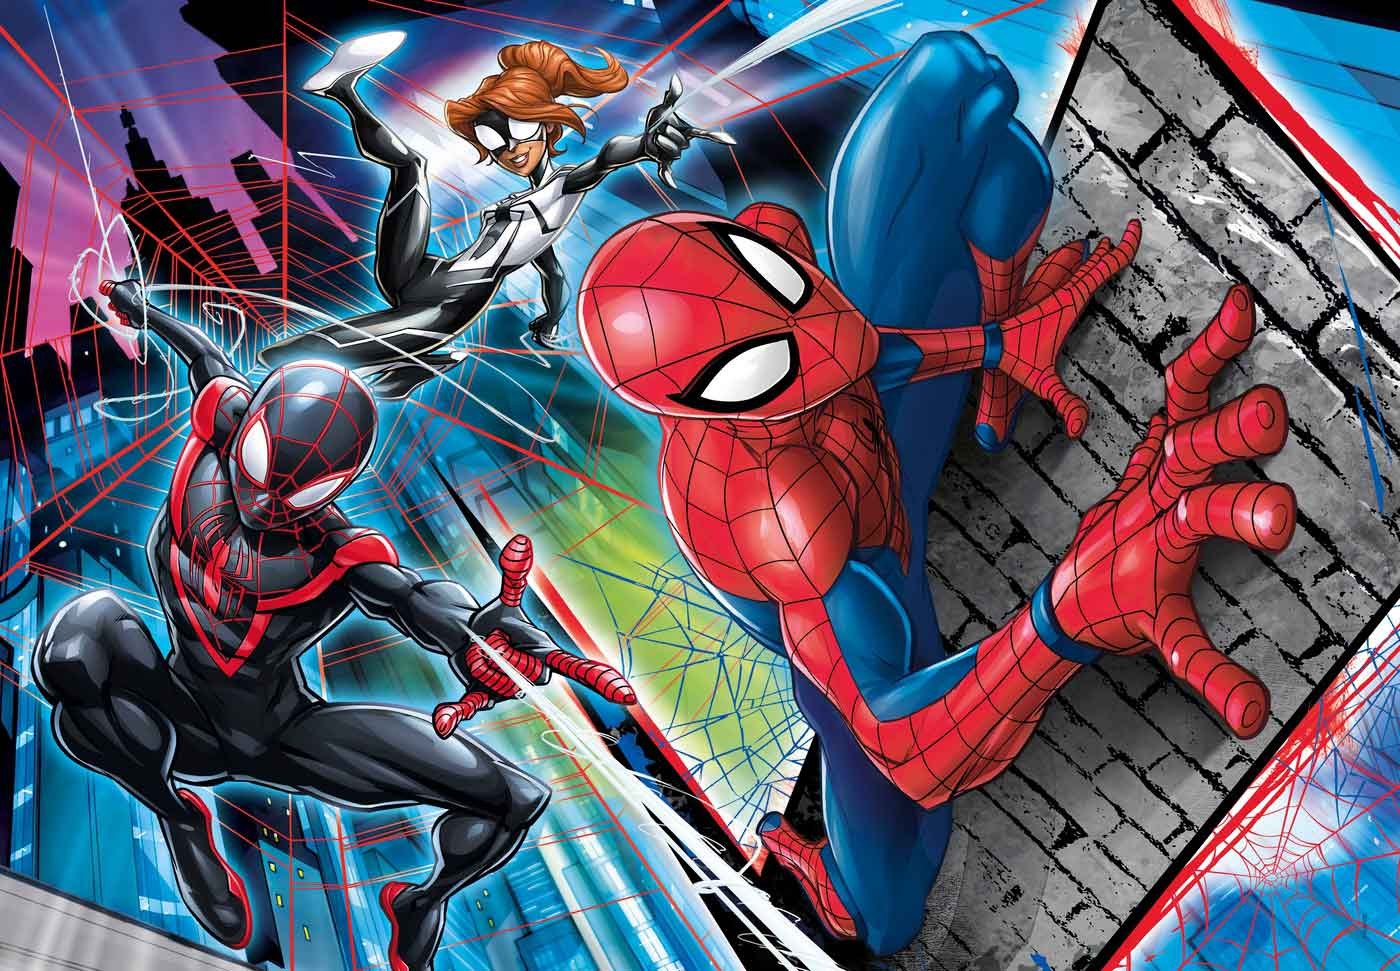 Puzzle Clementoni Spiderman de 180 Piezas